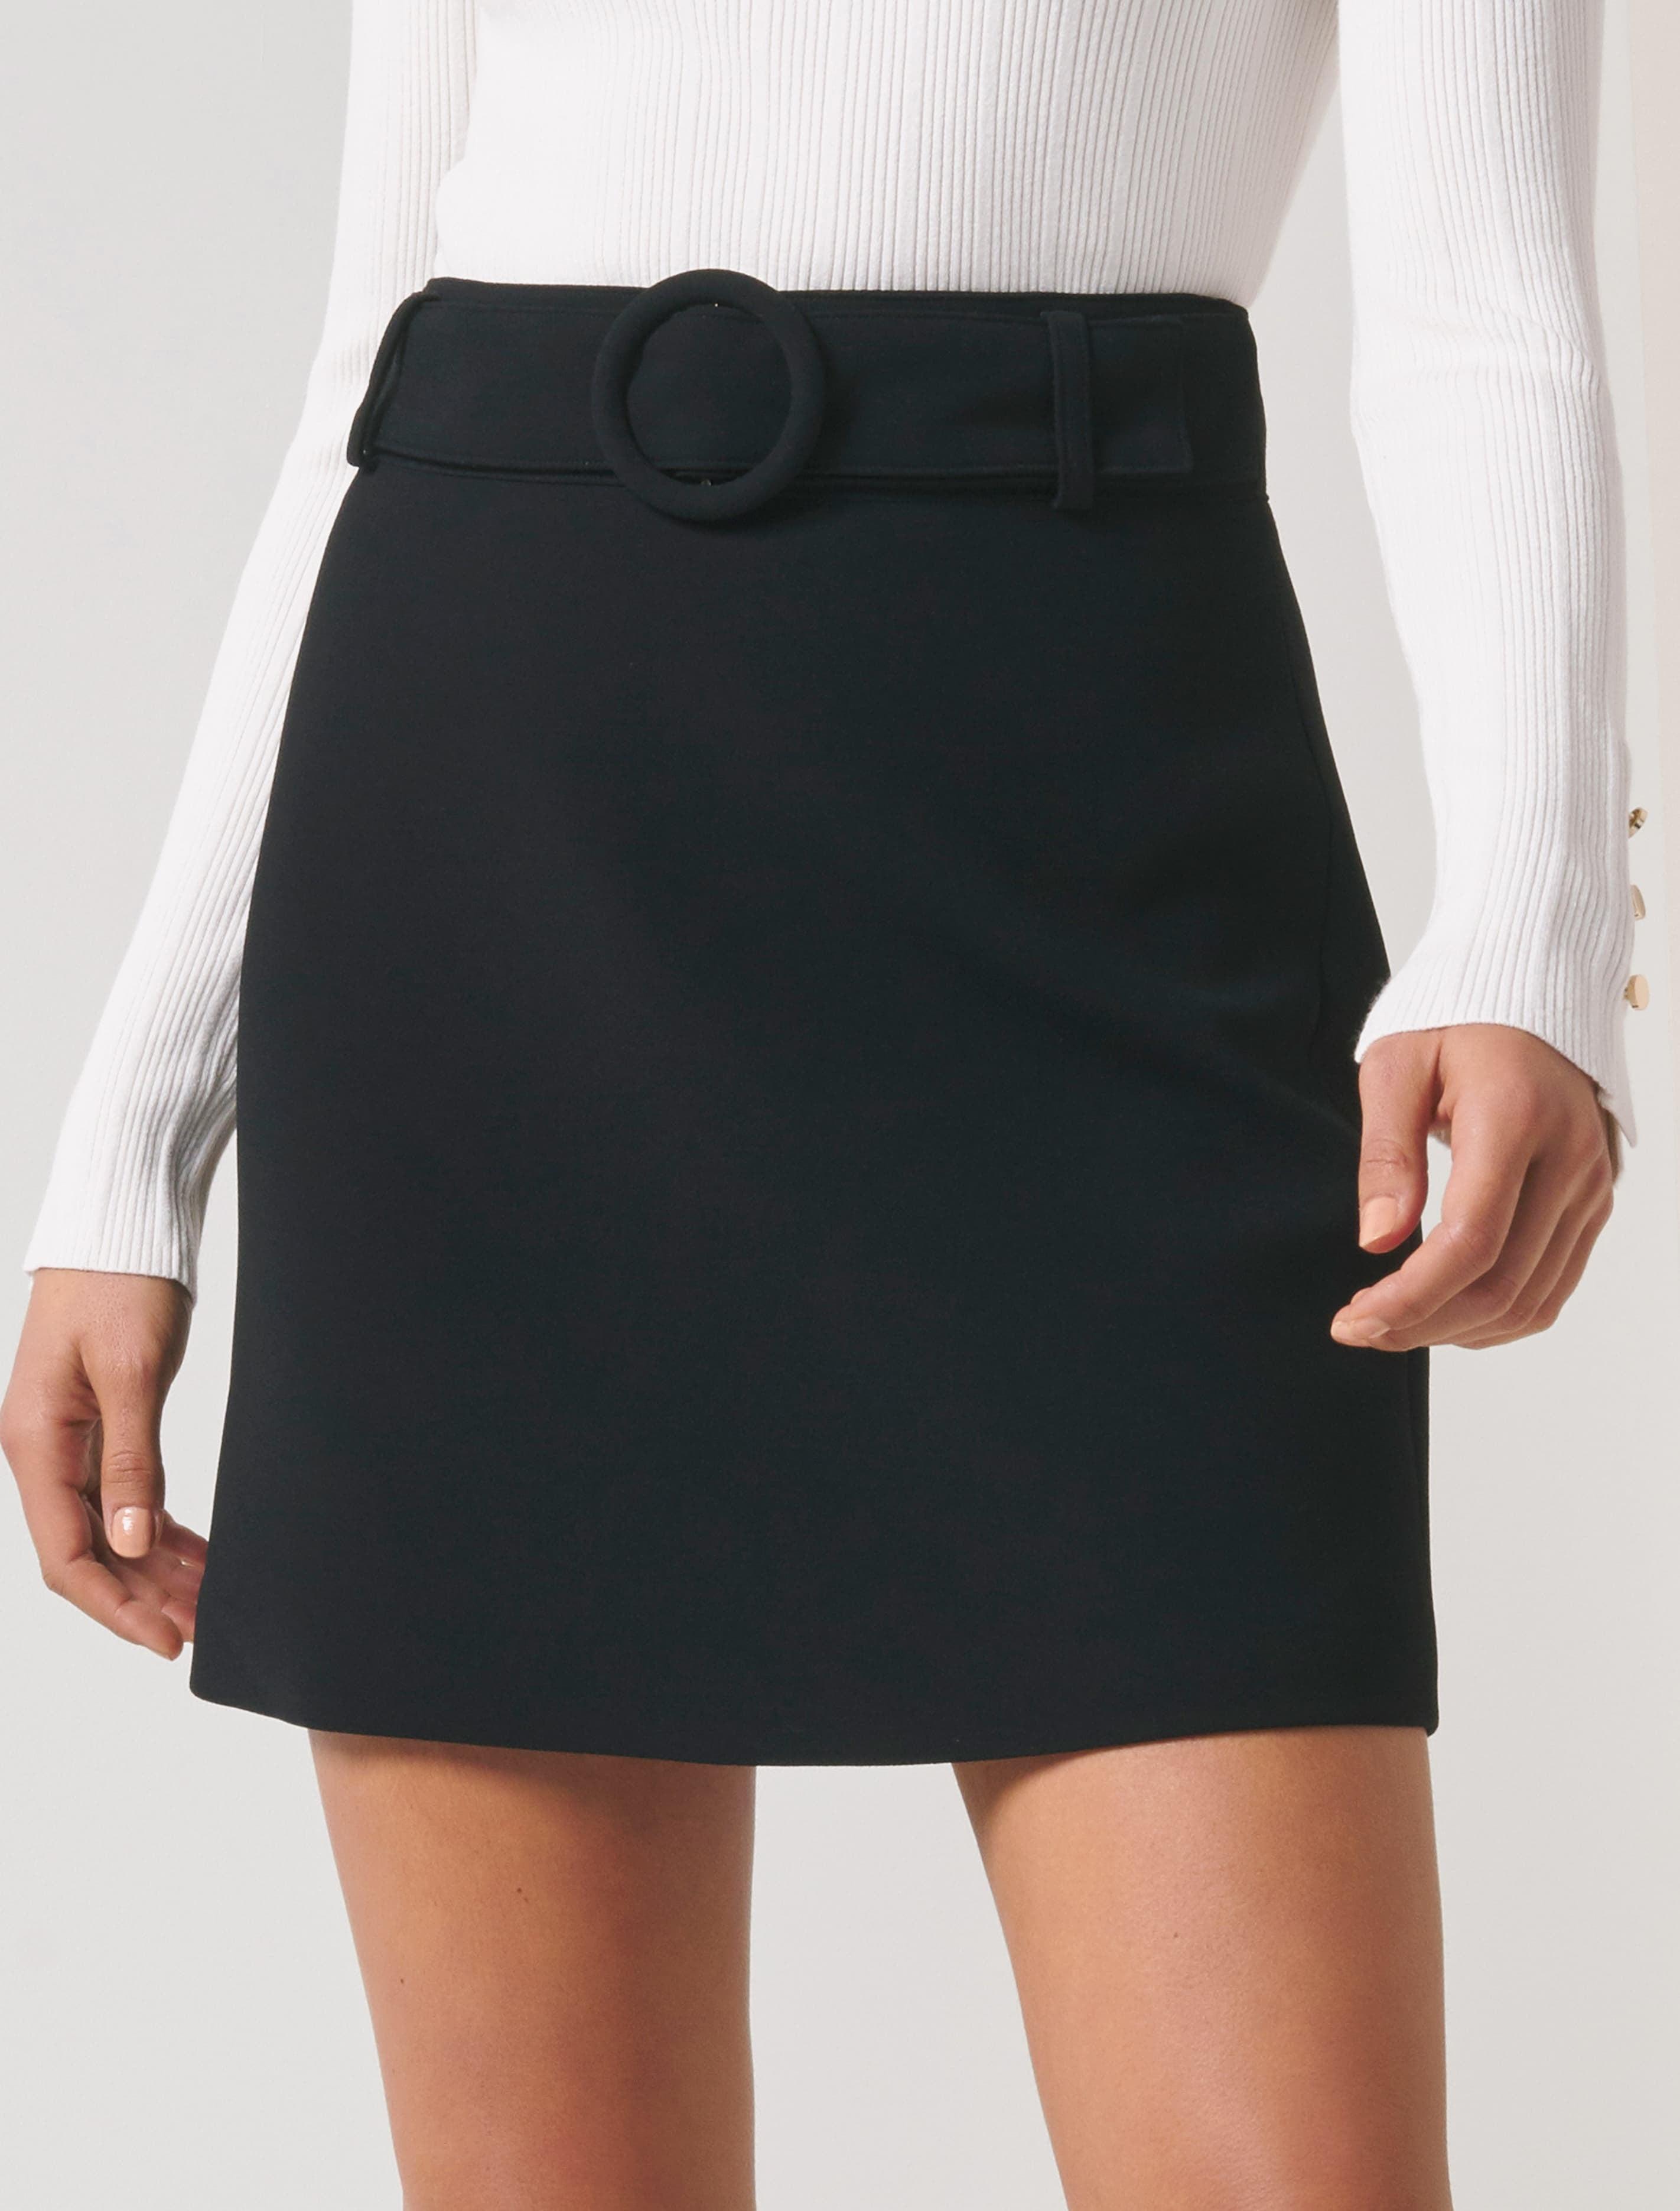 60s Skirts | 70s Hippie Skirts, Jumper Dresses Anabelle Belted Crepe Mini Skirt - Black - 12 $71.99 AT vintagedancer.com